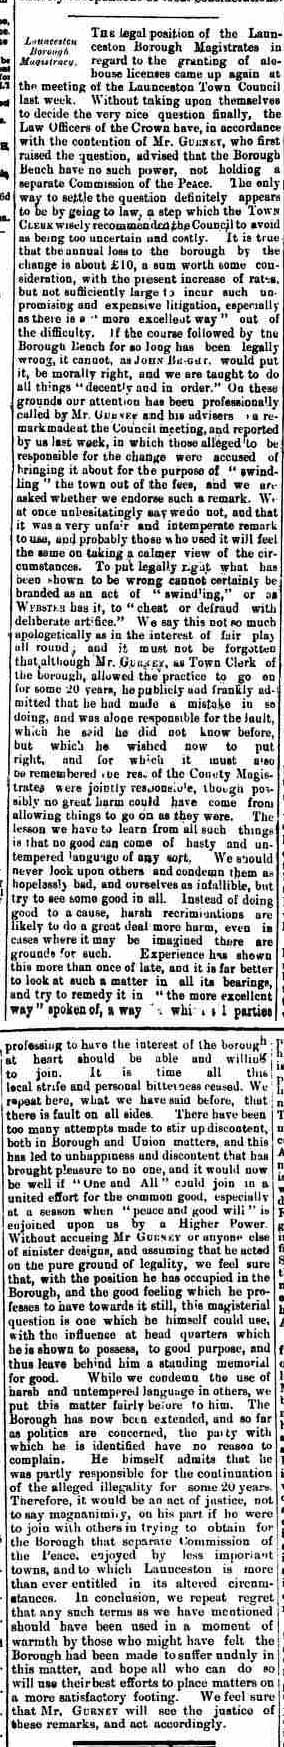 21 December 1889